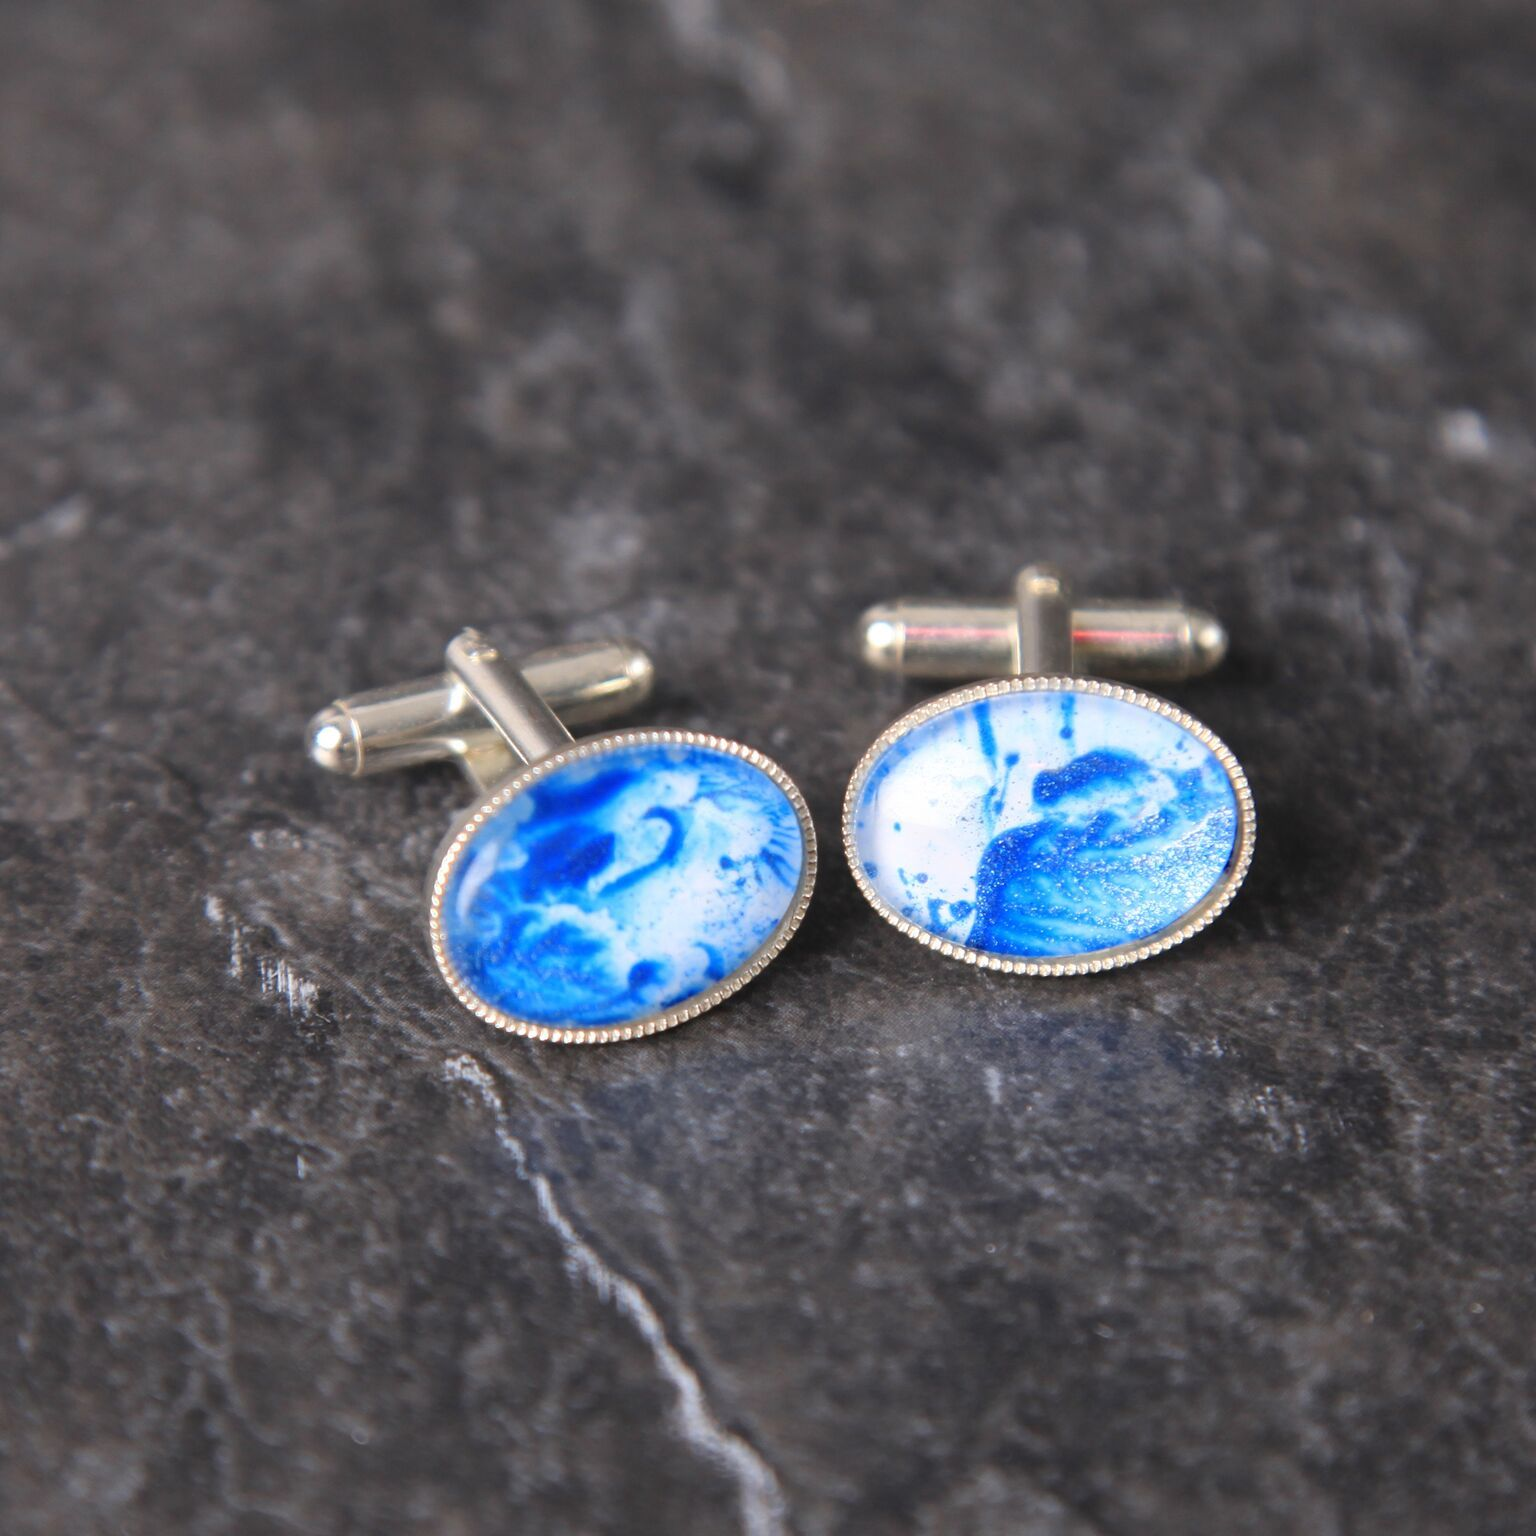 Unique Handmade Blue silver cuff links